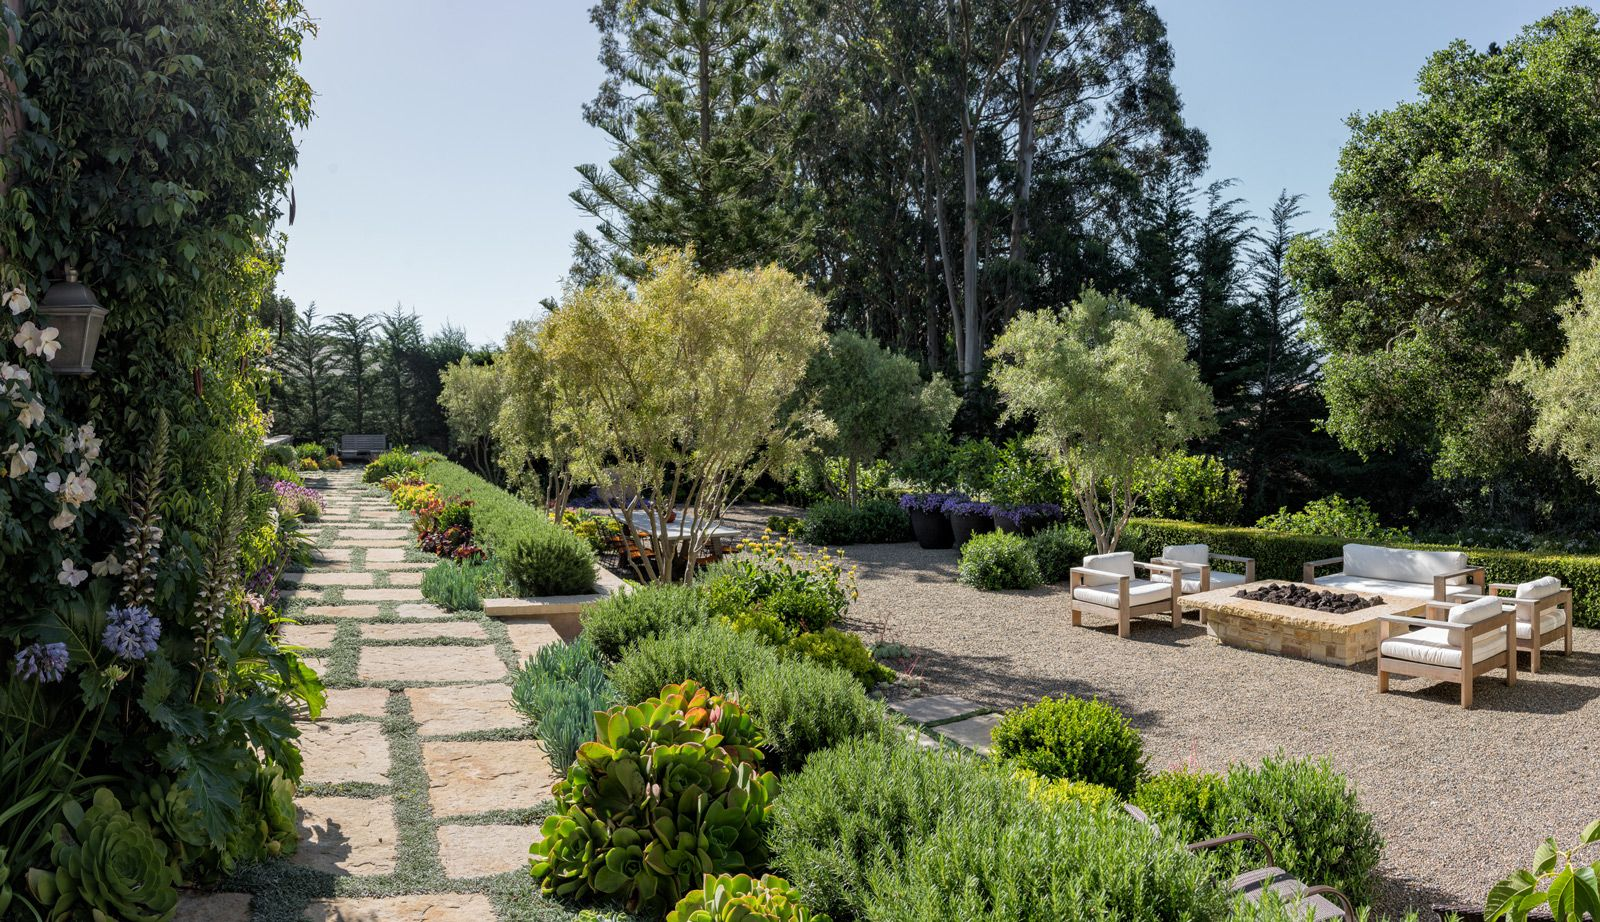 Designing With Nature The 2018 Australian Landscape Conference The Planthunter Garden Design Beautiful Gardens Landscape Design